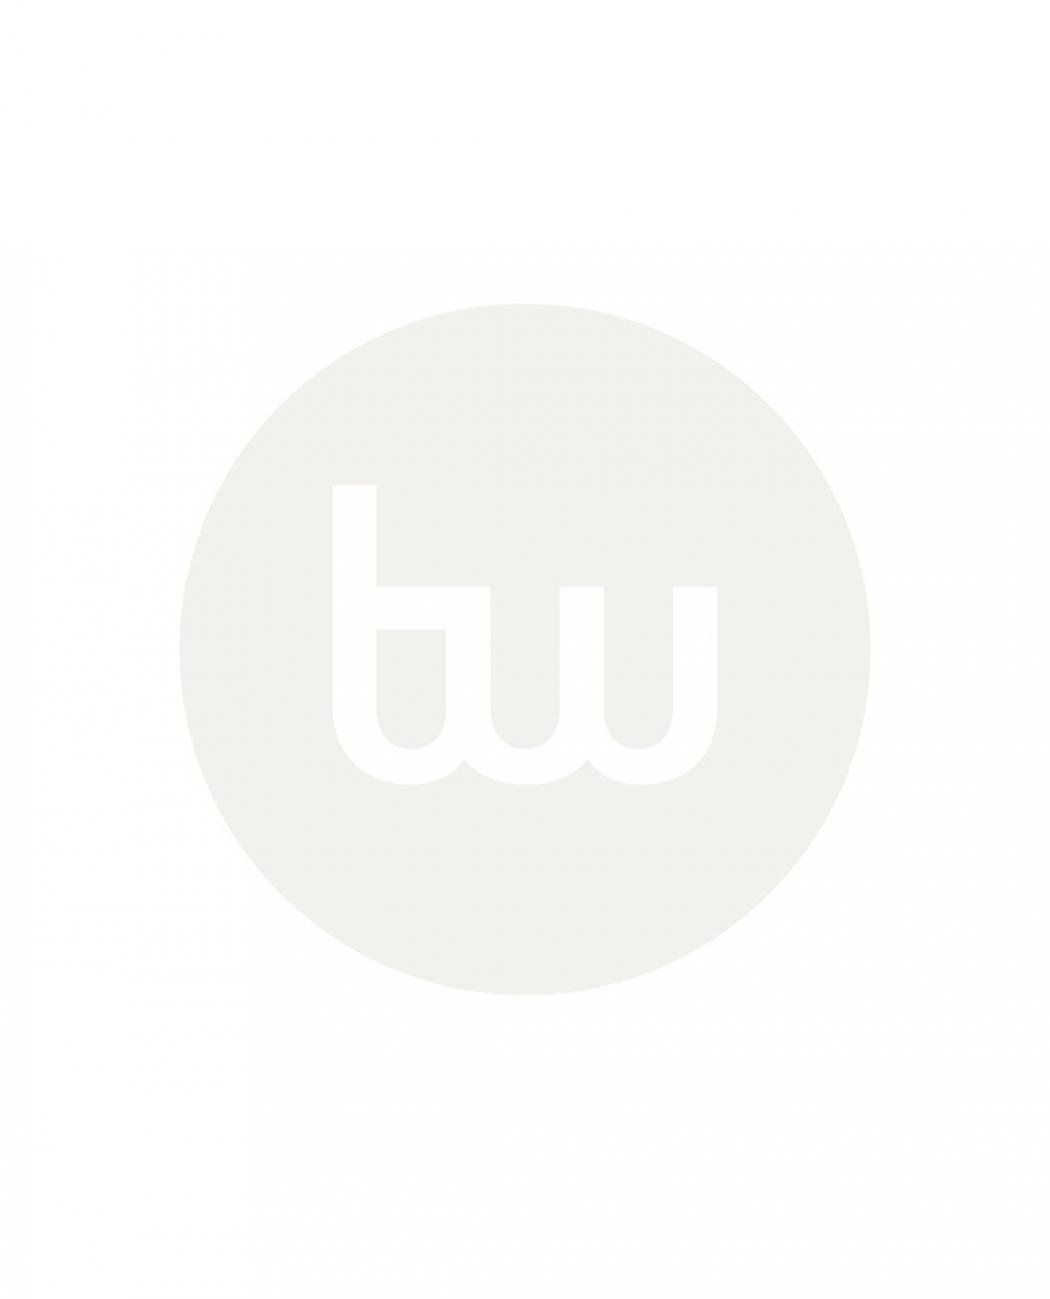 bbae8398eb Oakley Infinite Hero Sliver Digital Camo   Black Iridium - TACWRK